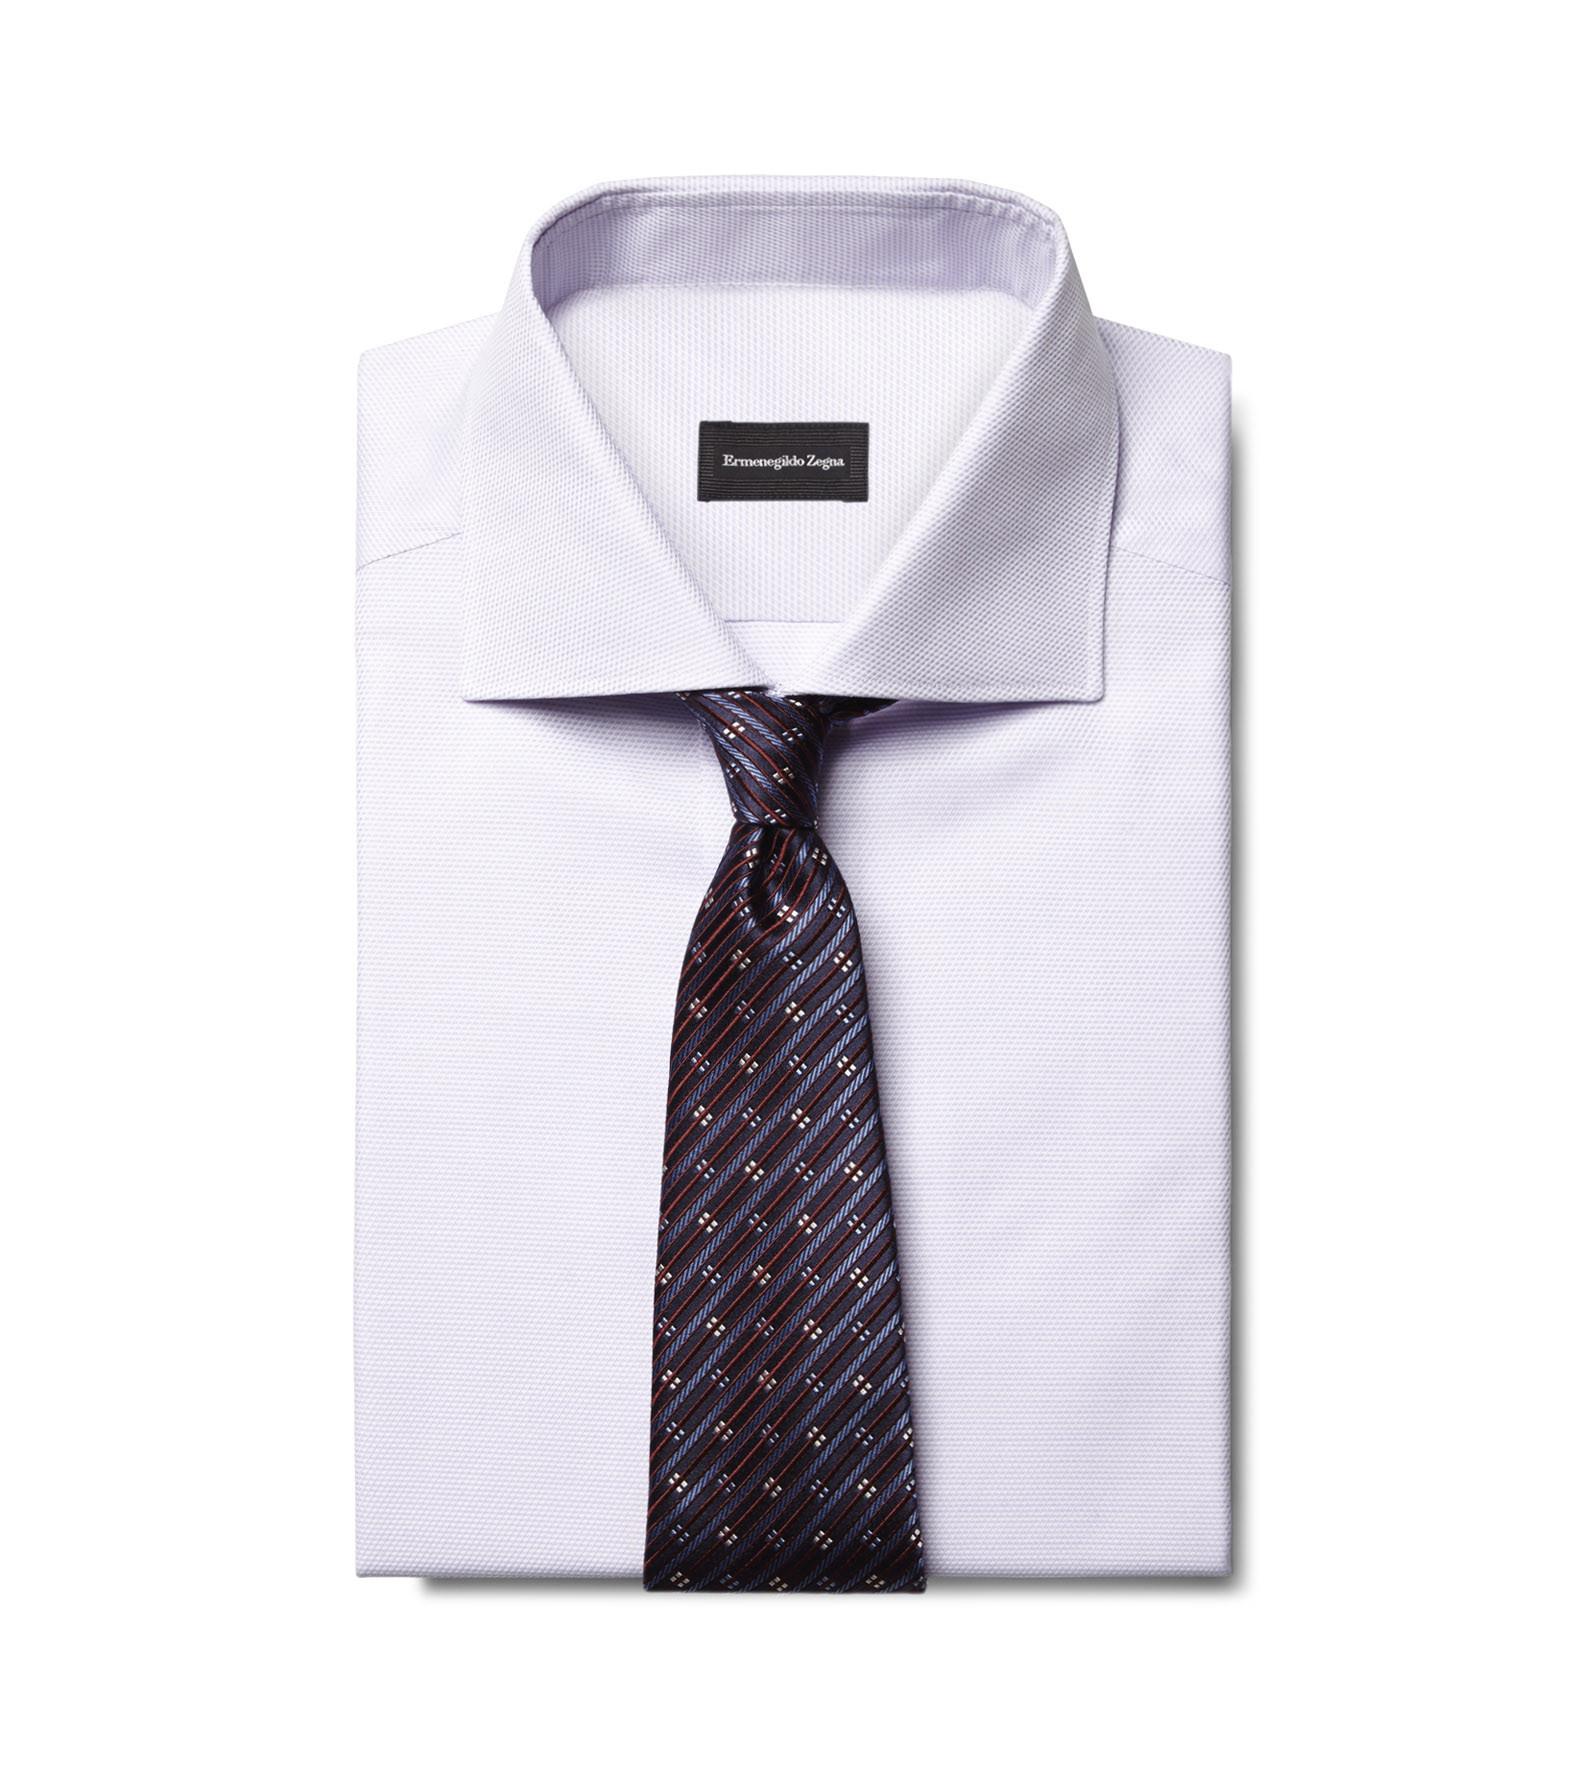 Ermenegildo zegna Blue/Burgundy/White Silk Diamonds Tie in Blue ...